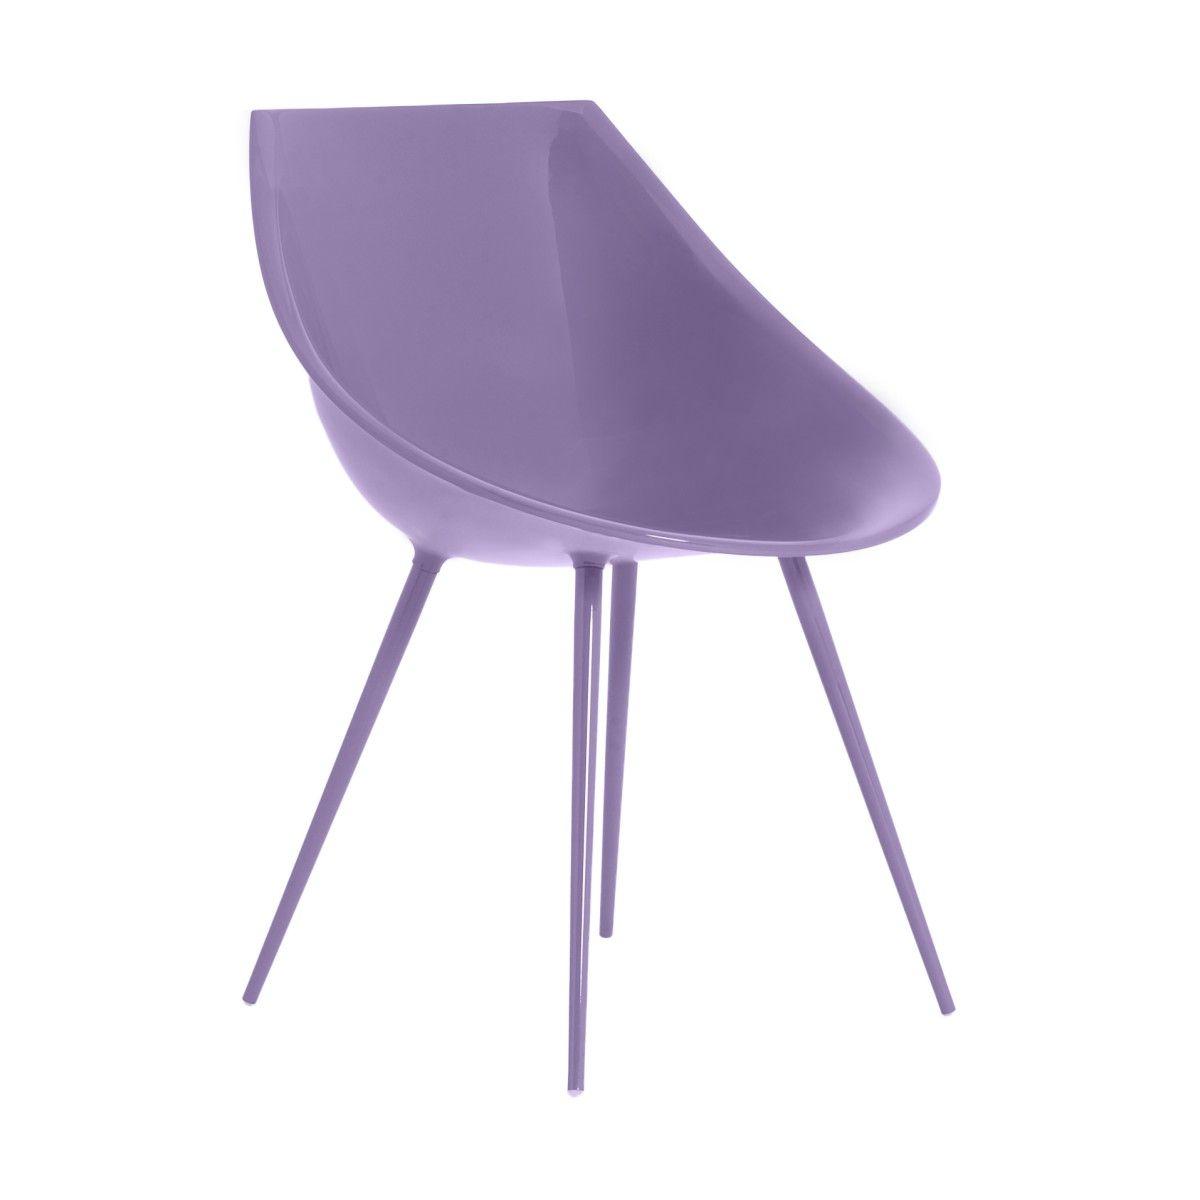 Sedia Lagò lilla design di Philippe Starck | DRIADE | Sedie | Pinterest